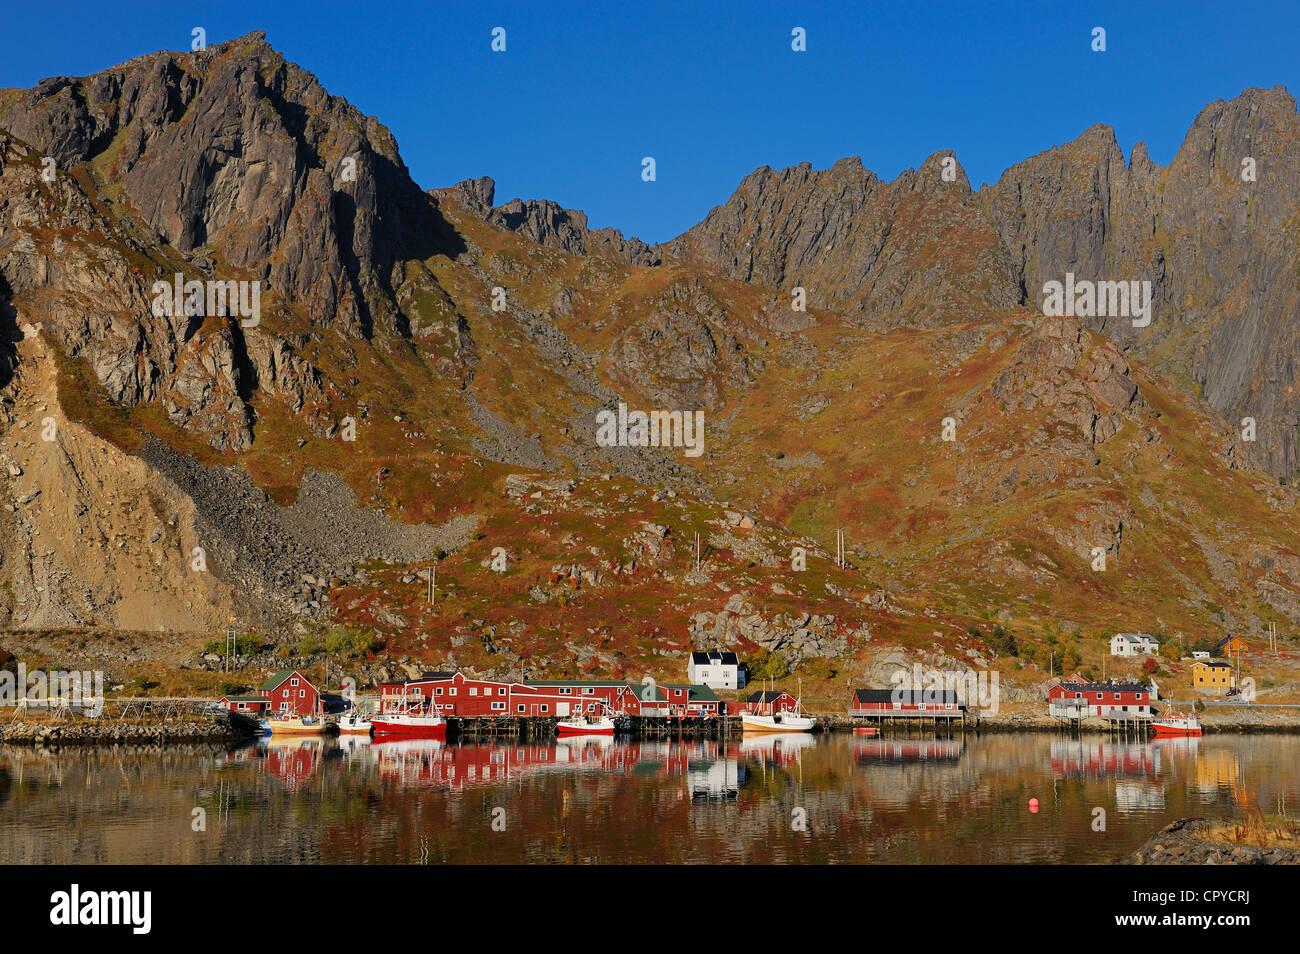 Norway, Nordland County, Lofoten Islands, Vestvagoy Island, Ballstad harbour - Stock Image